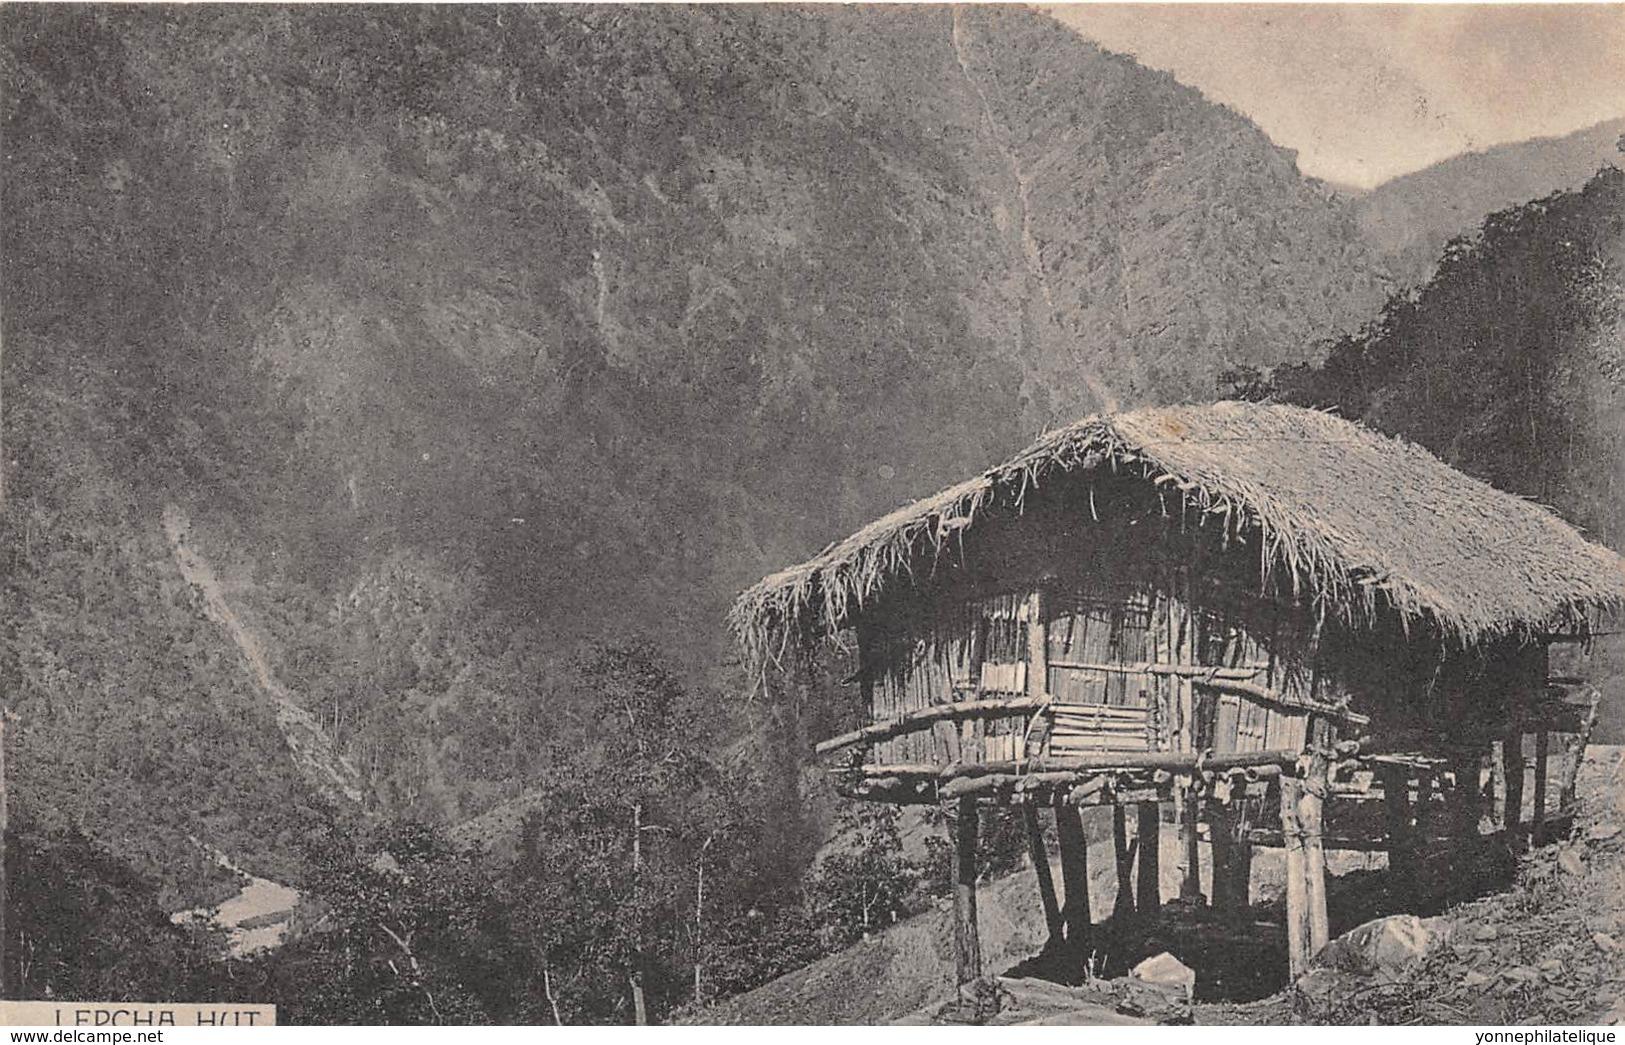 Sikkim / 01 - Lepcha Hut - Cartes Postales